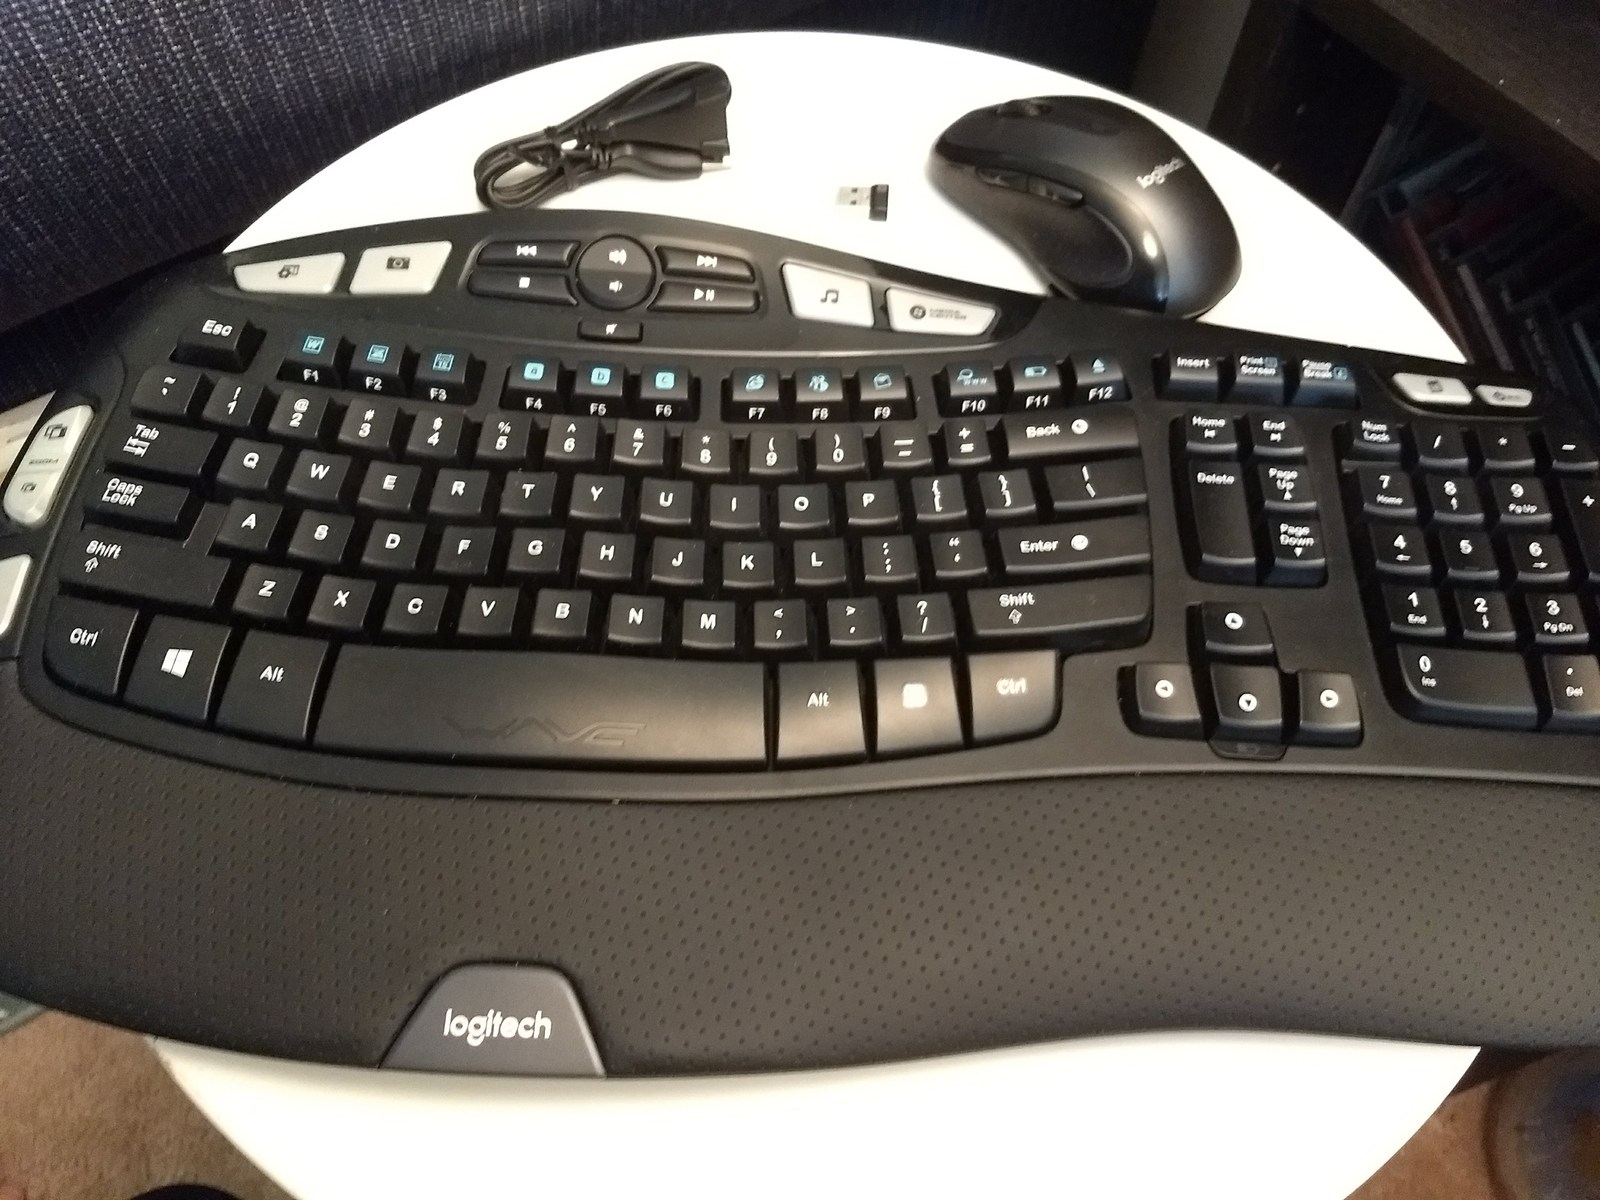 Logitech MK550 Comfort Wave Wireless Keyboard Combo image 2